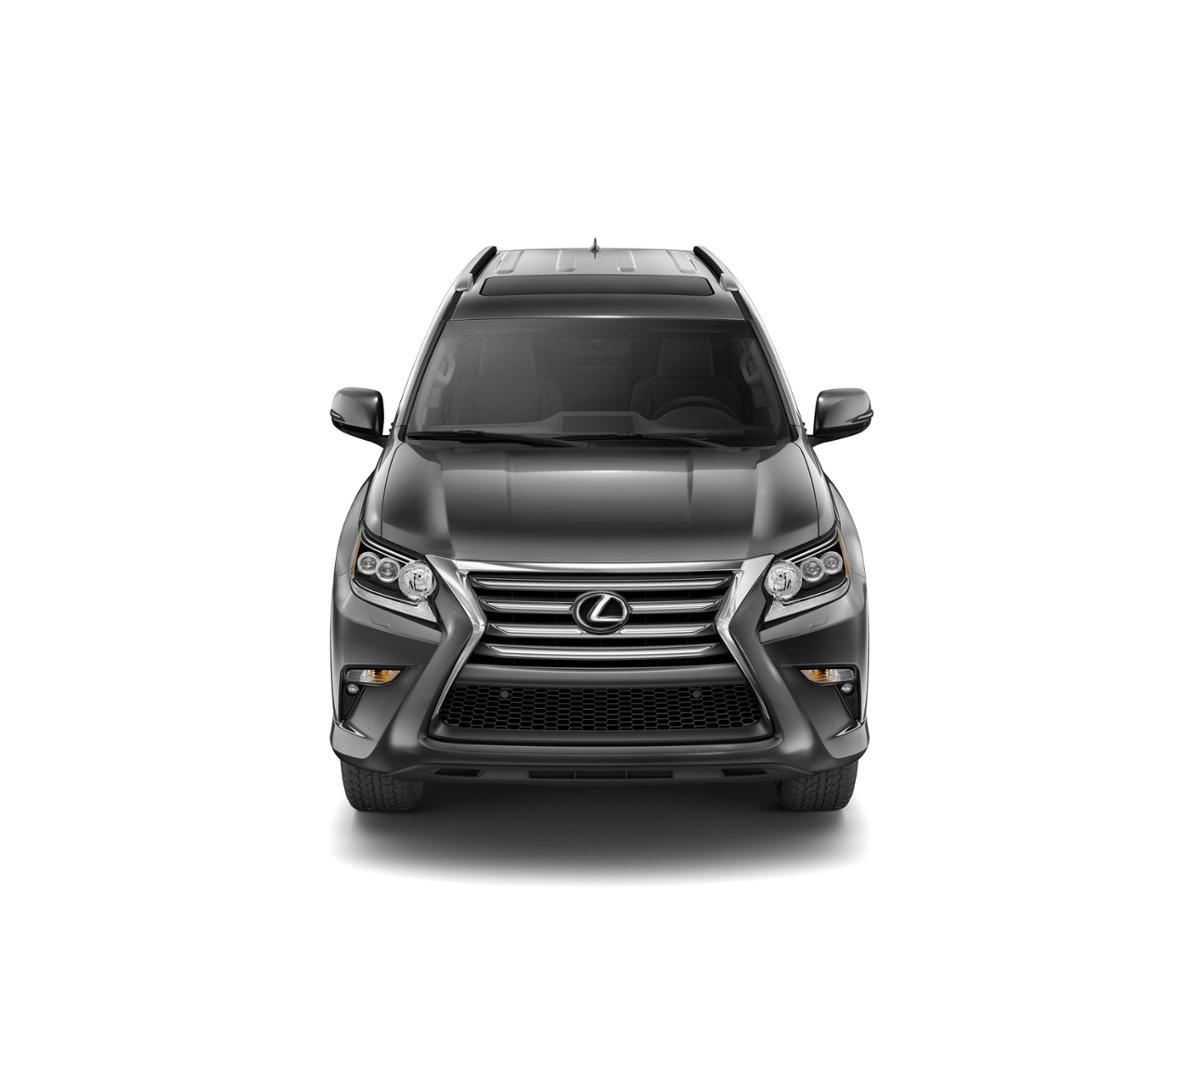 2017 Lexus Gx 460 For Sale In El Cajon At Lexus El Cajon